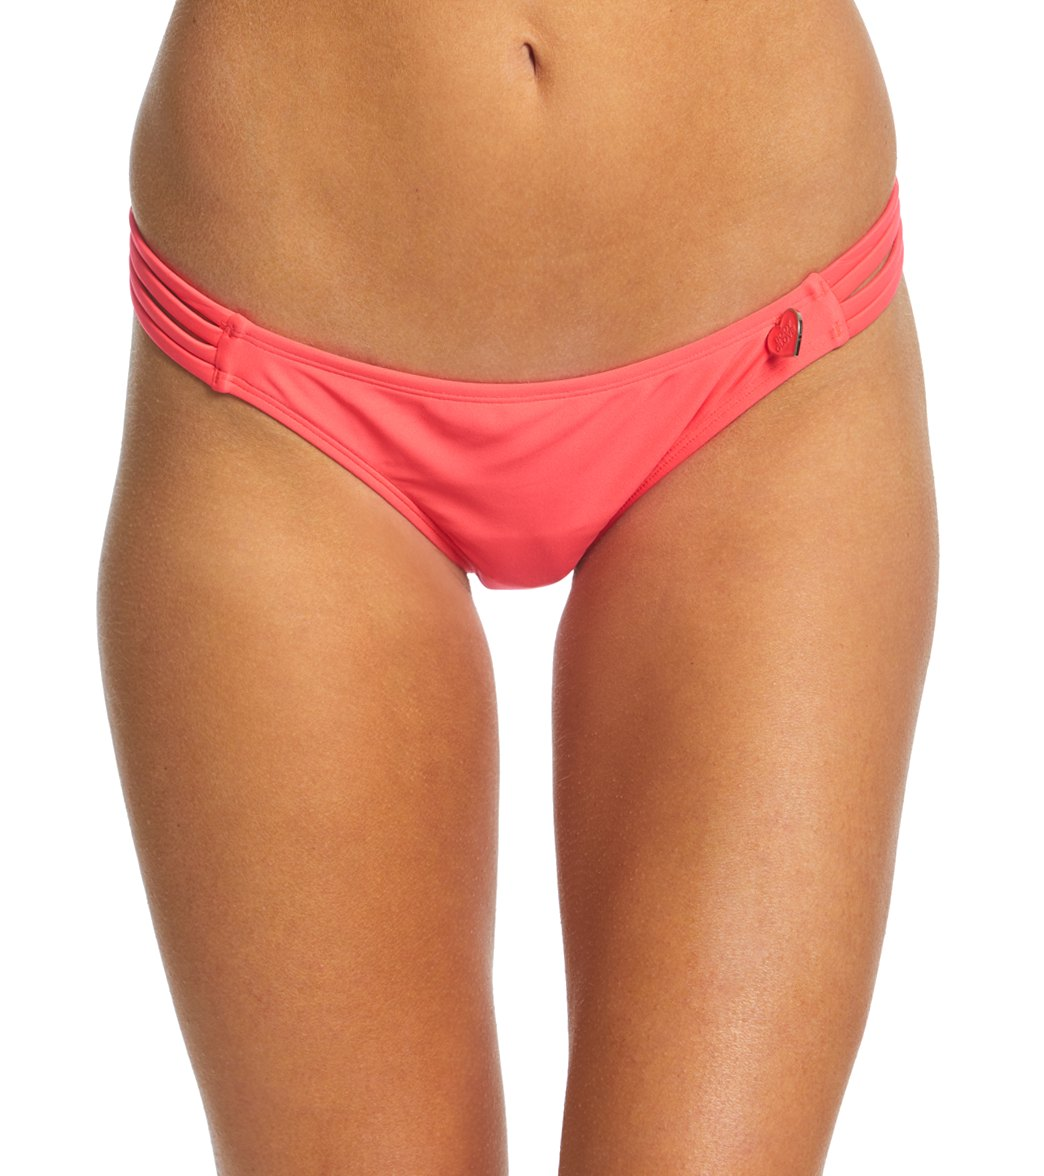 Body Glove Swimwear Smoothies Flirty Surf Rider Bikini Bottom